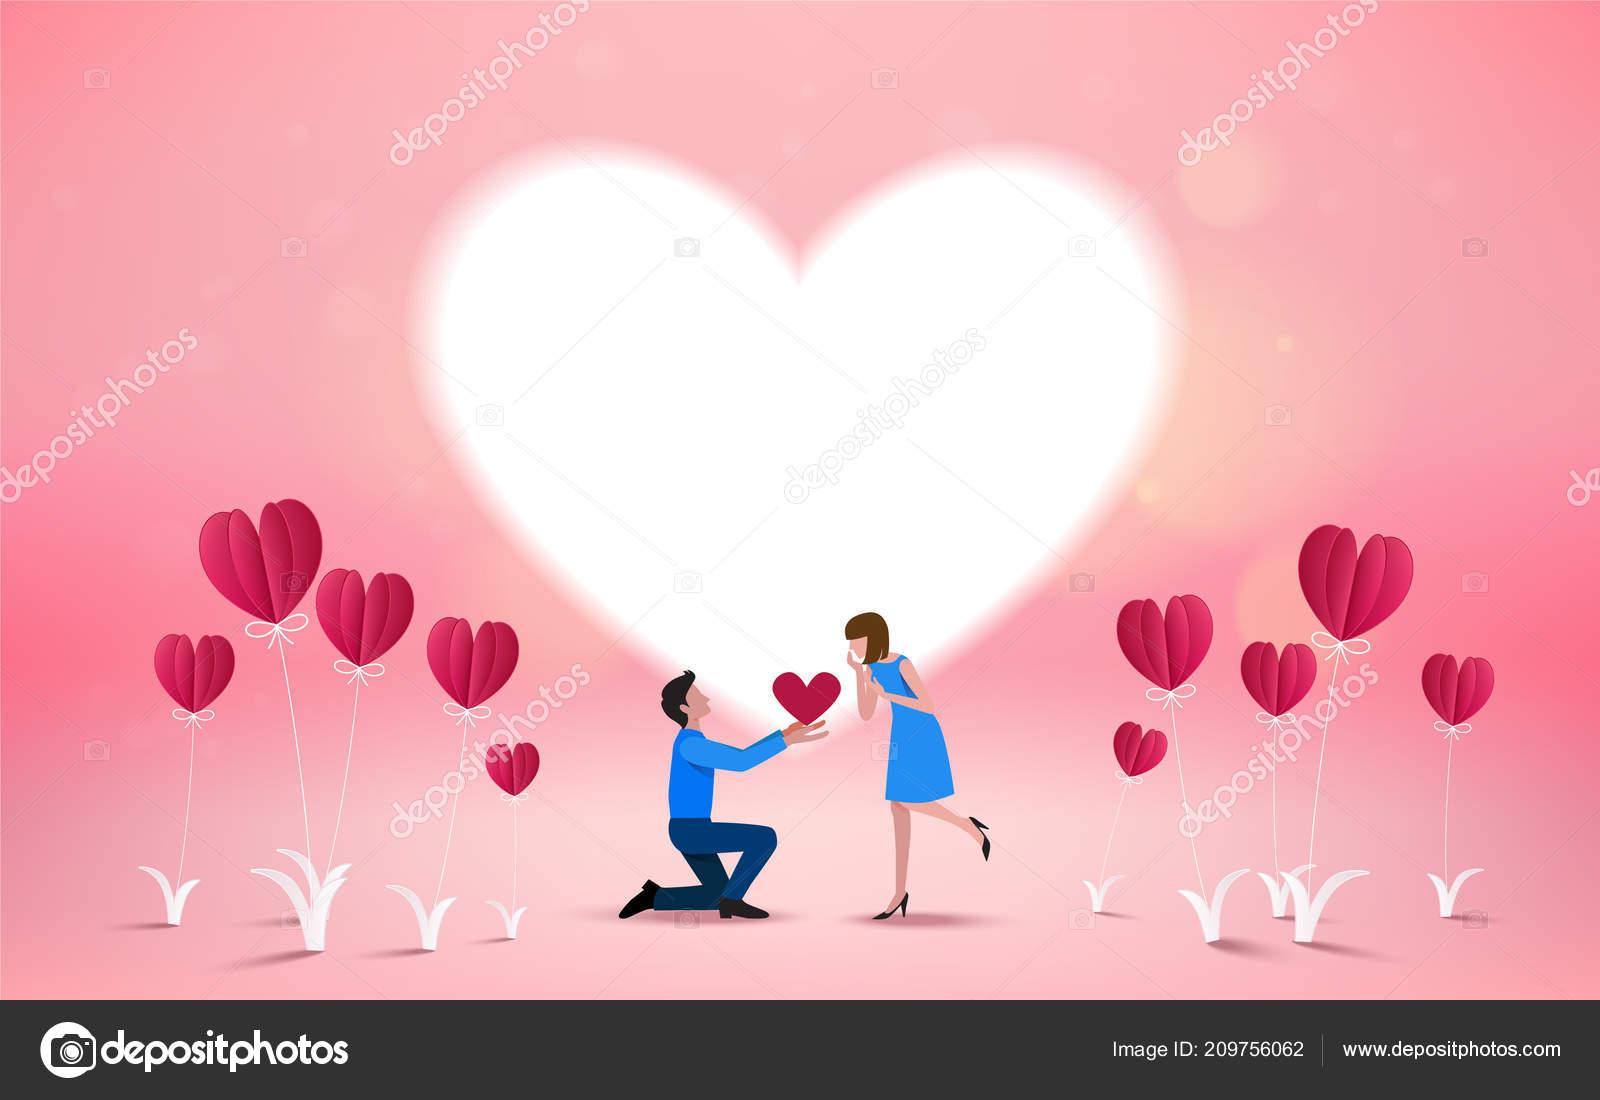 you marry invitation card vector illustrator love concept happy